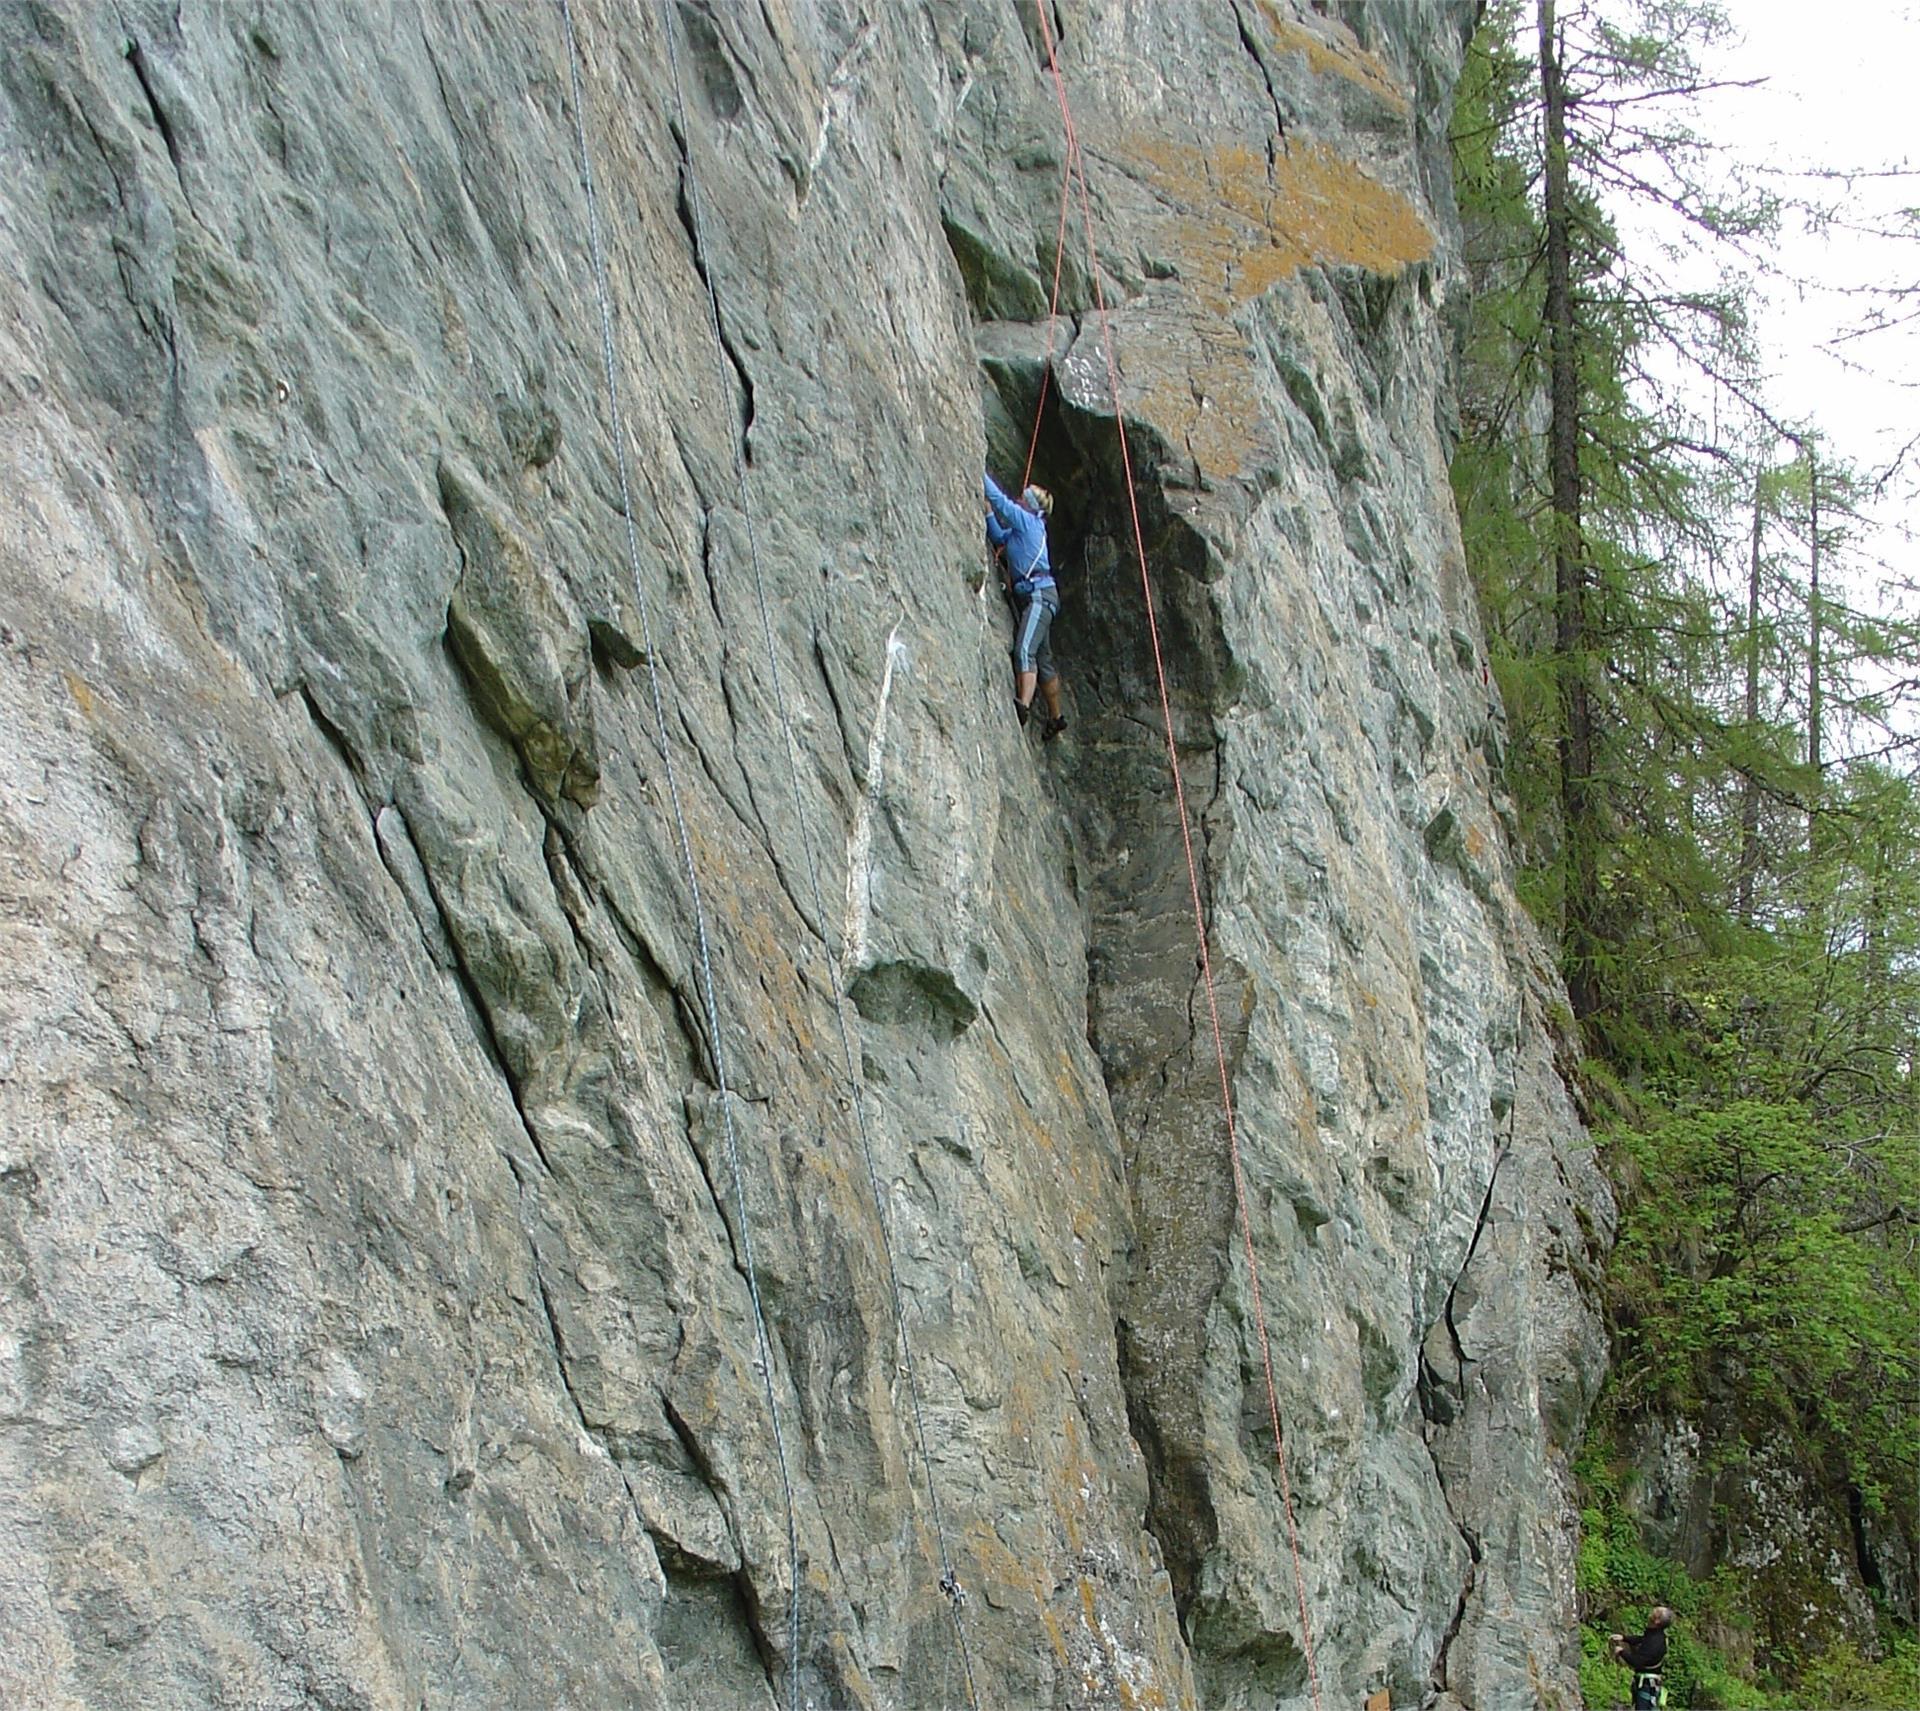 Climbing at the